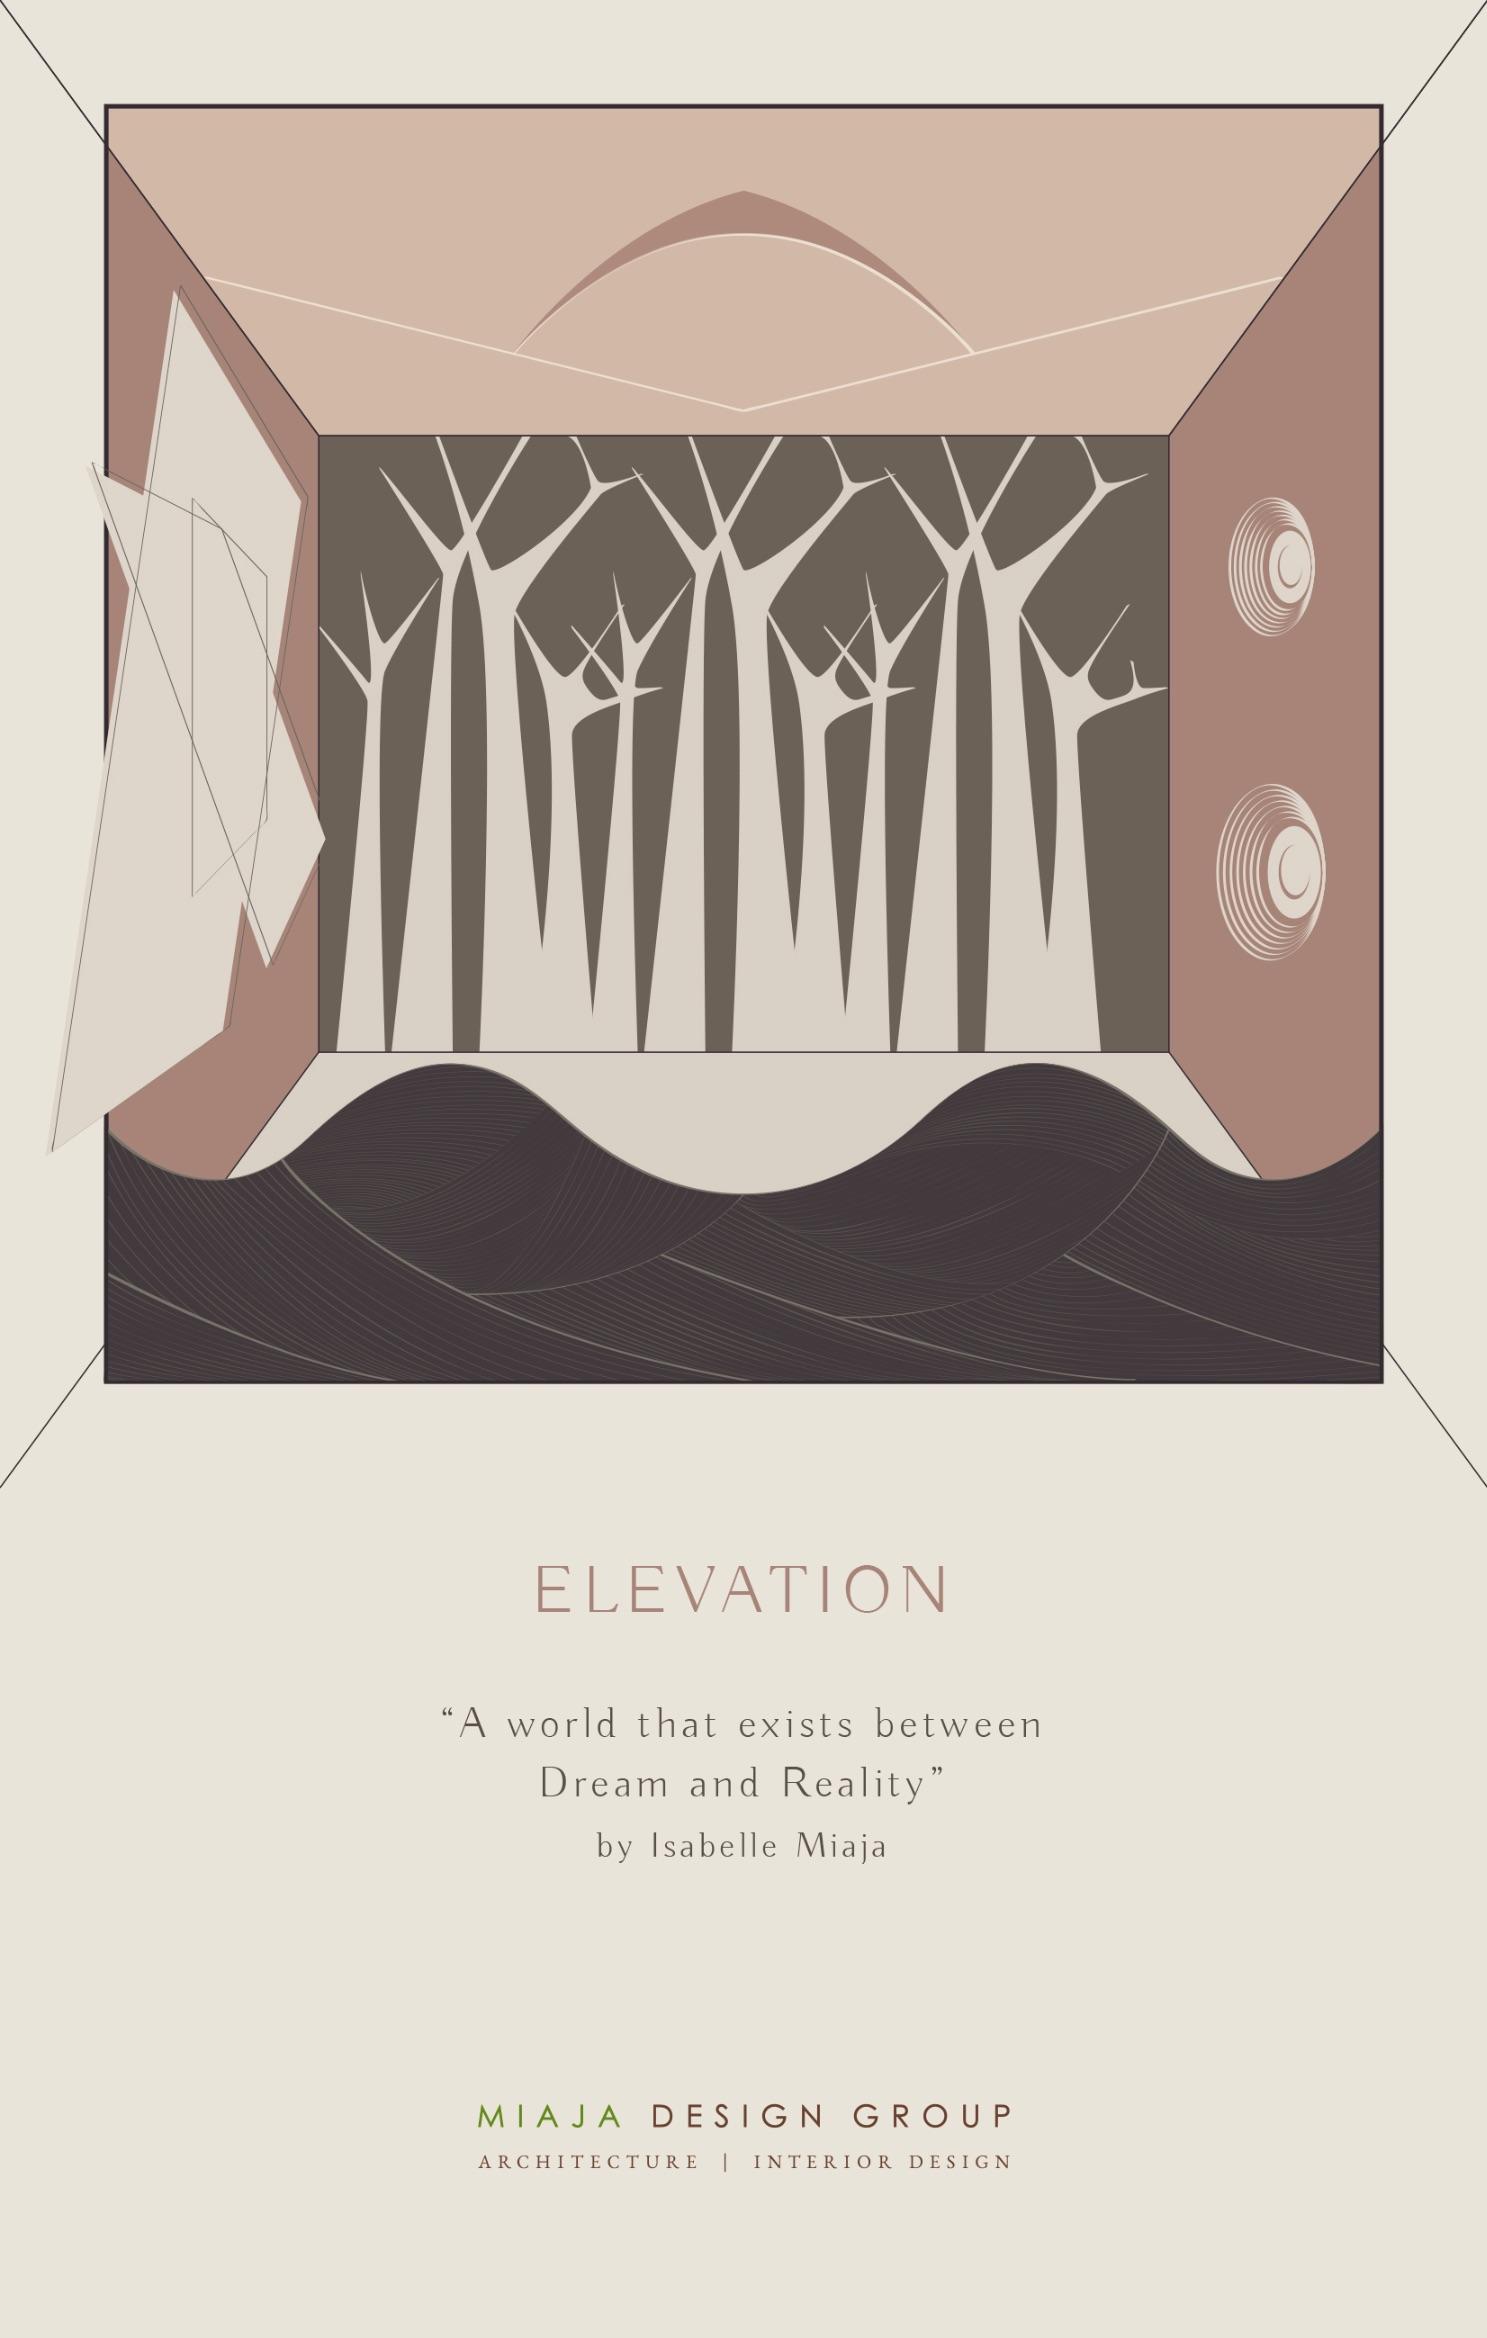 3_Graphic by Miaja Design Group_Sleep&Eat_Inspirationist